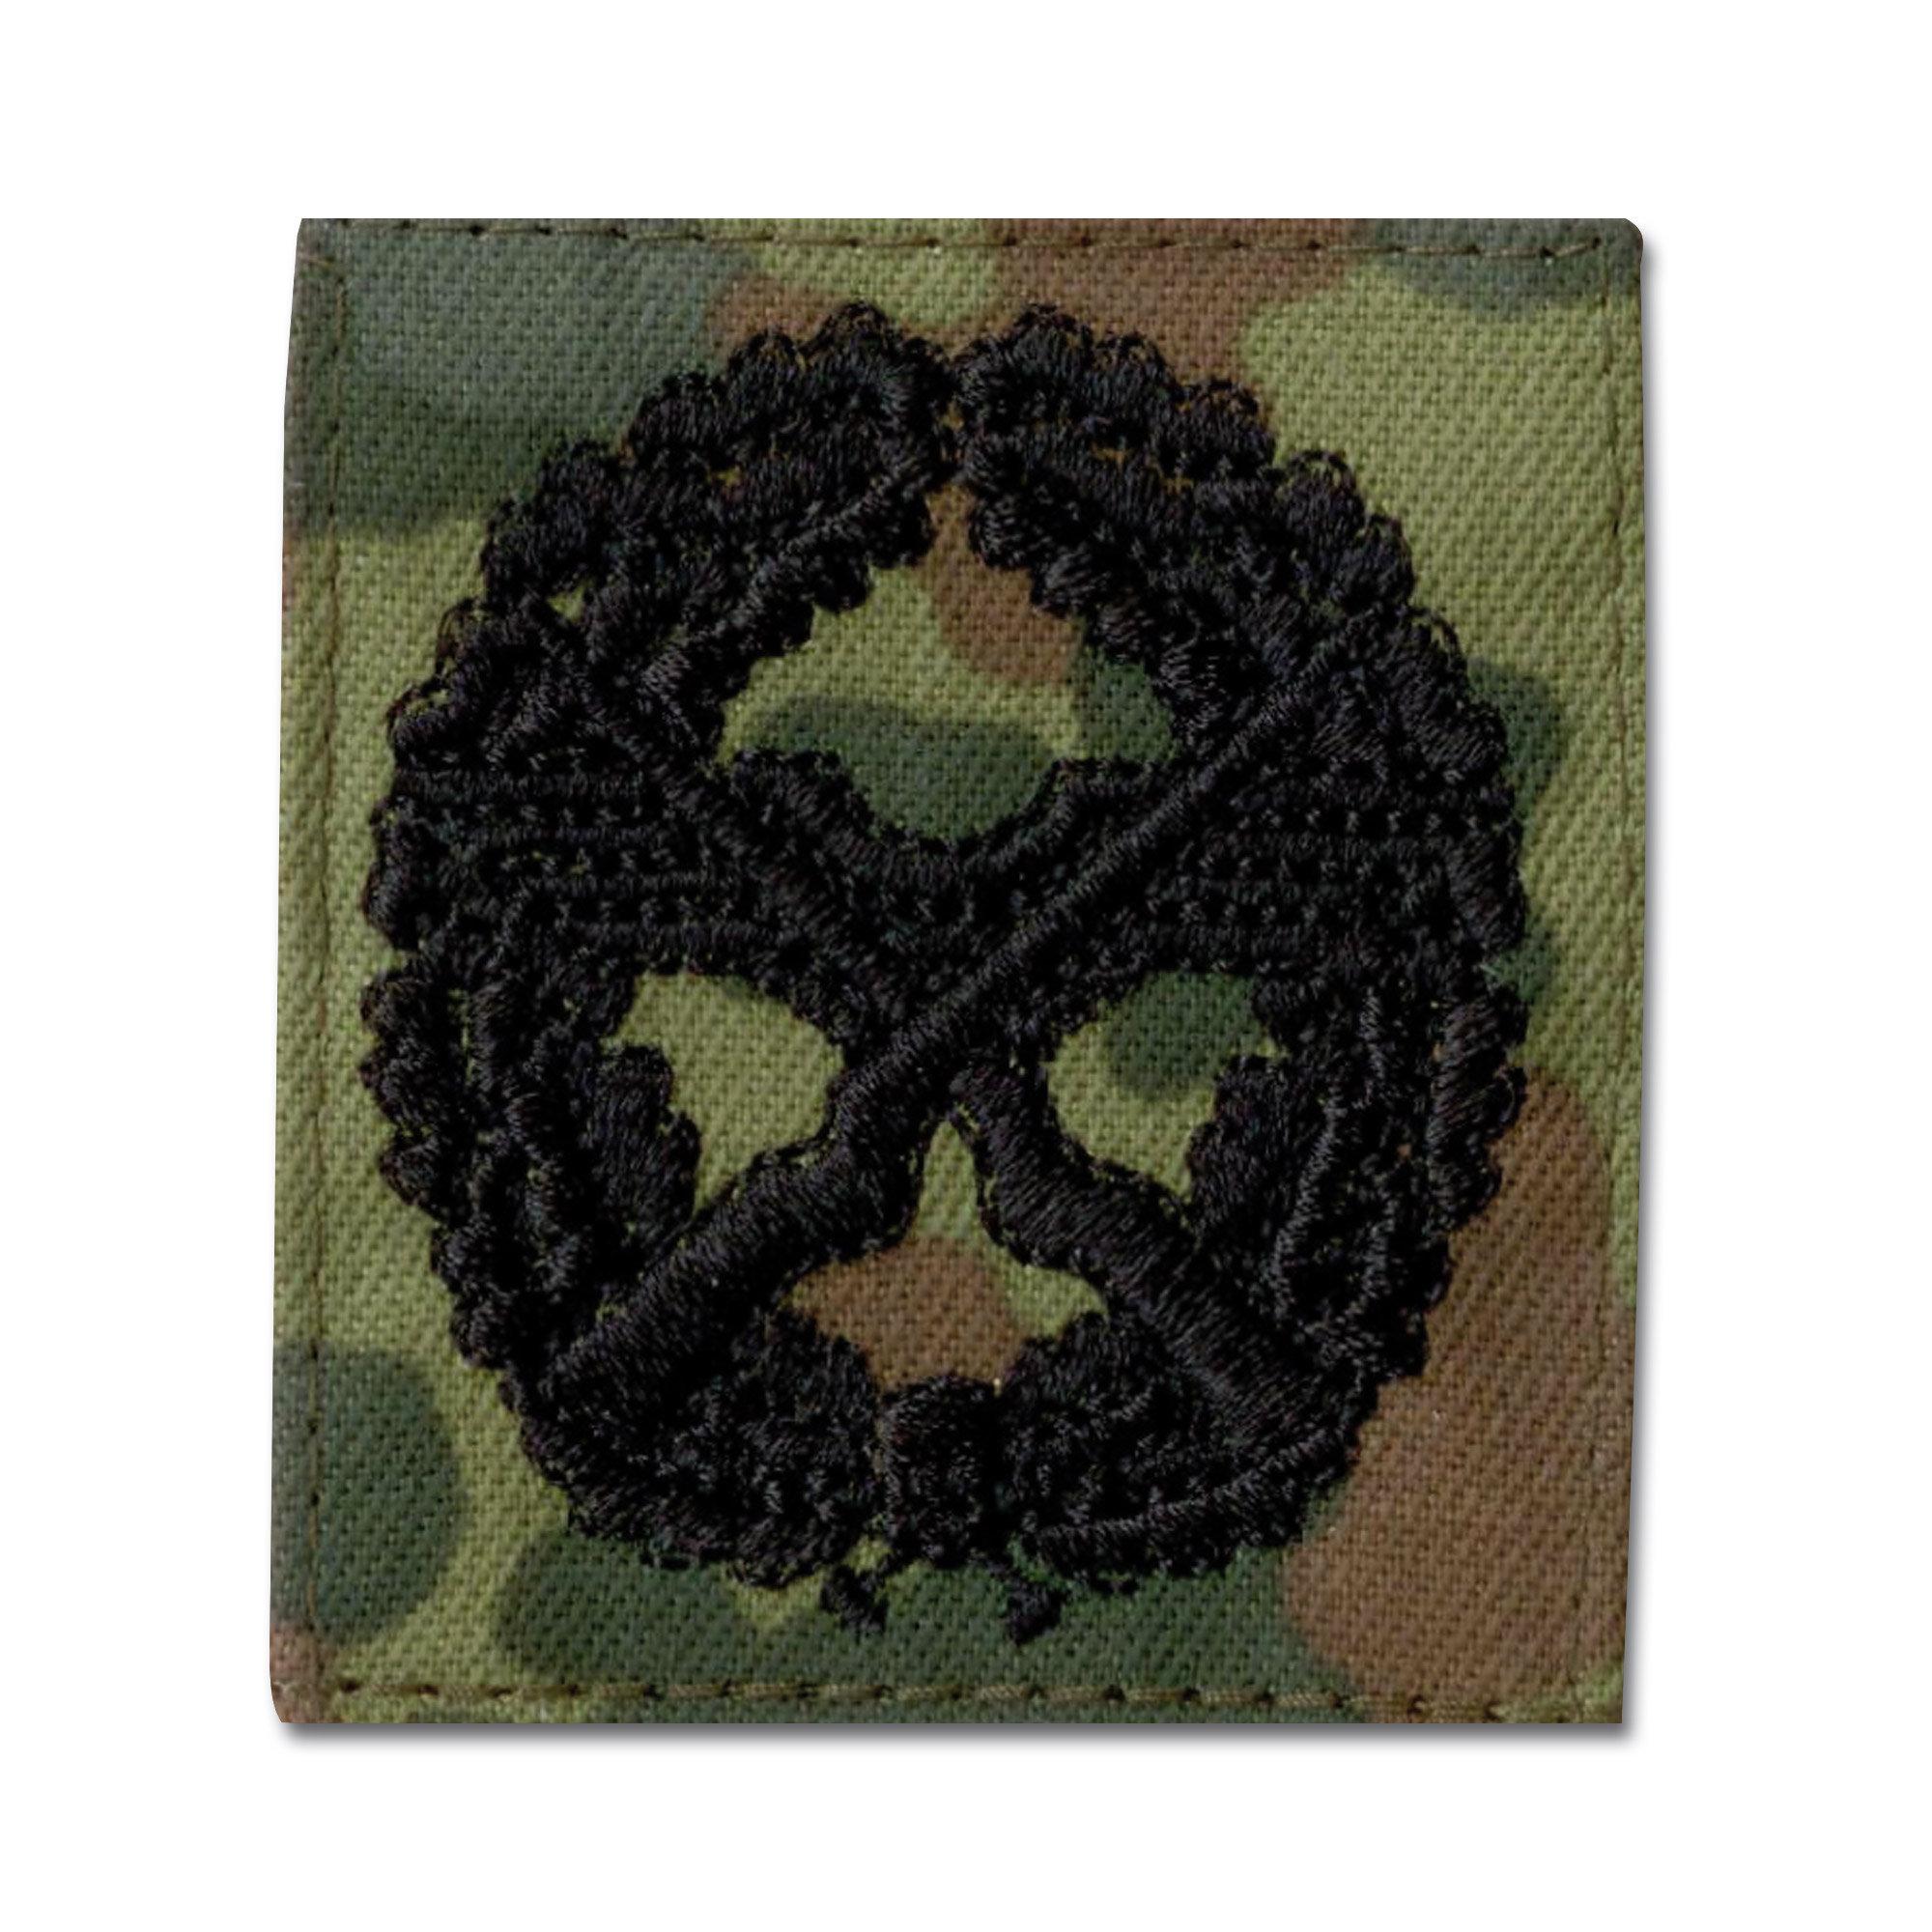 Insignia cloth Sichtruppführer flecktarn/black